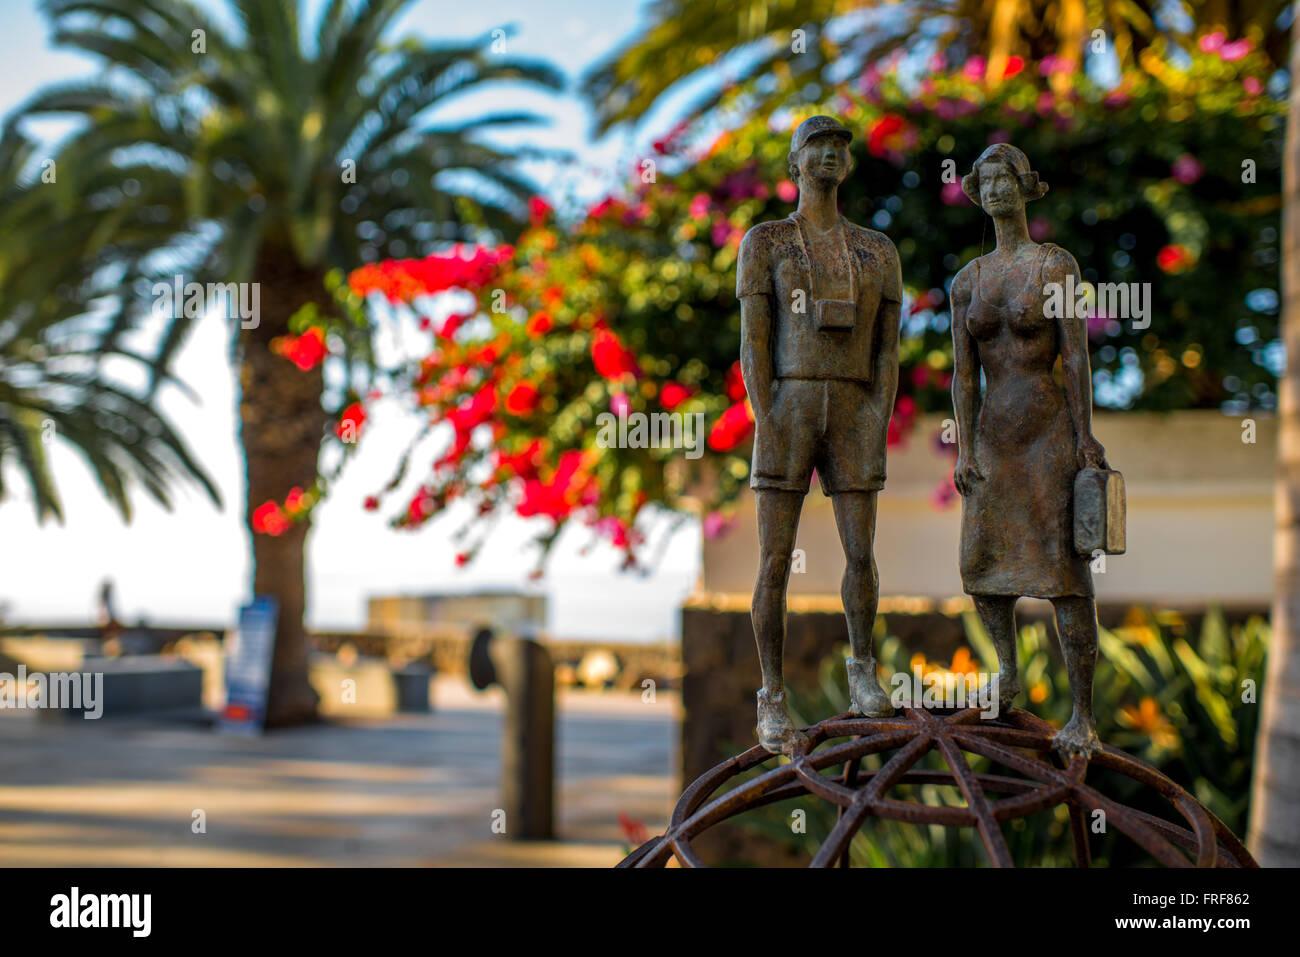 PUERTO DE LA CRUZ, TENERIFE island, SPAIN - DECEMBER 16, 2015: Small sculpture of two young couple travelers in - Stock Image